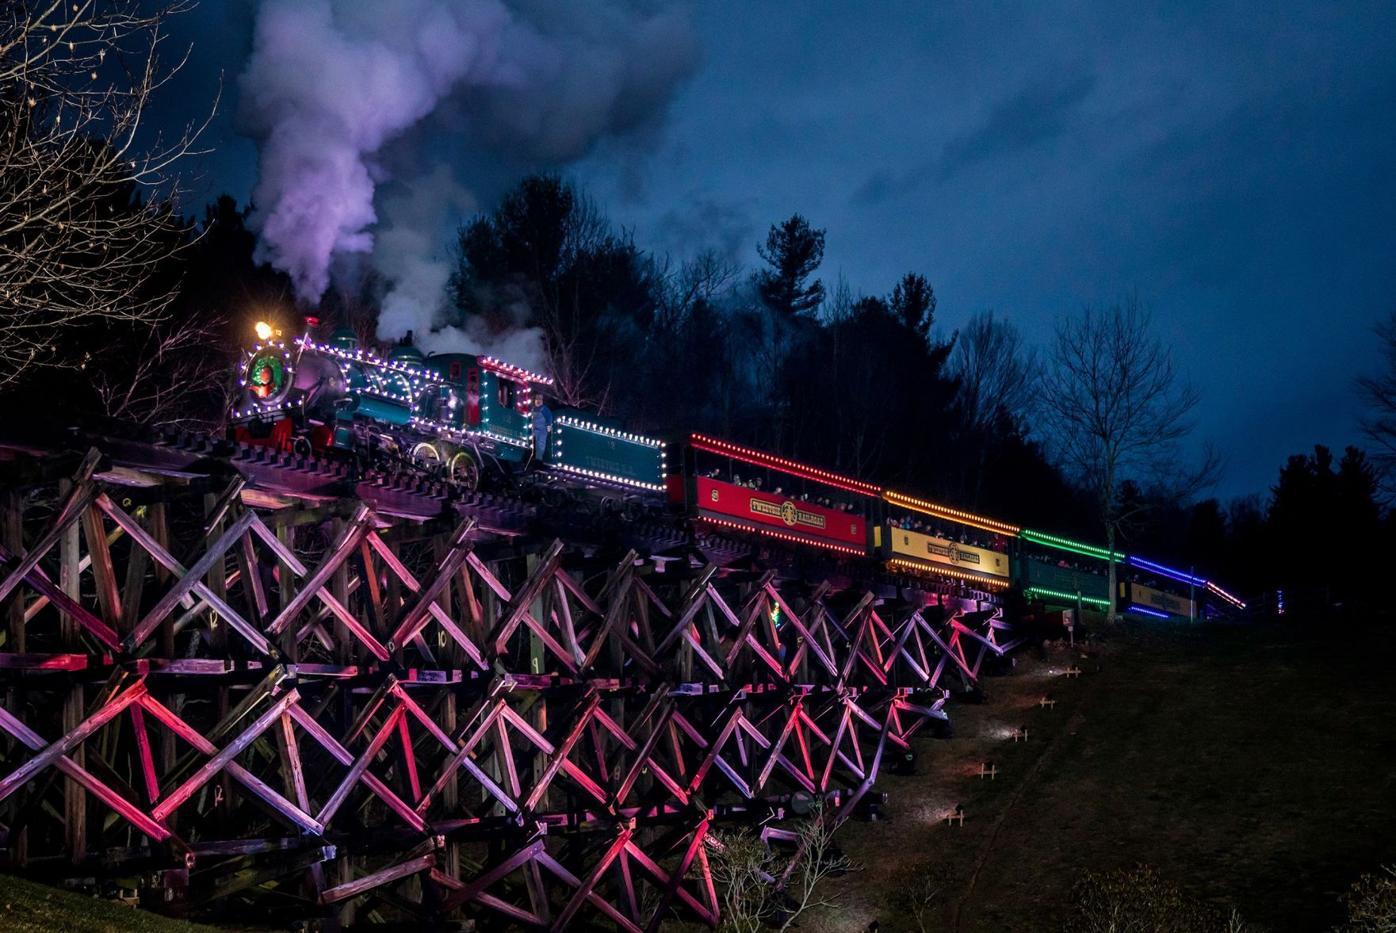 Tweetsie Christmas train steams across trestle